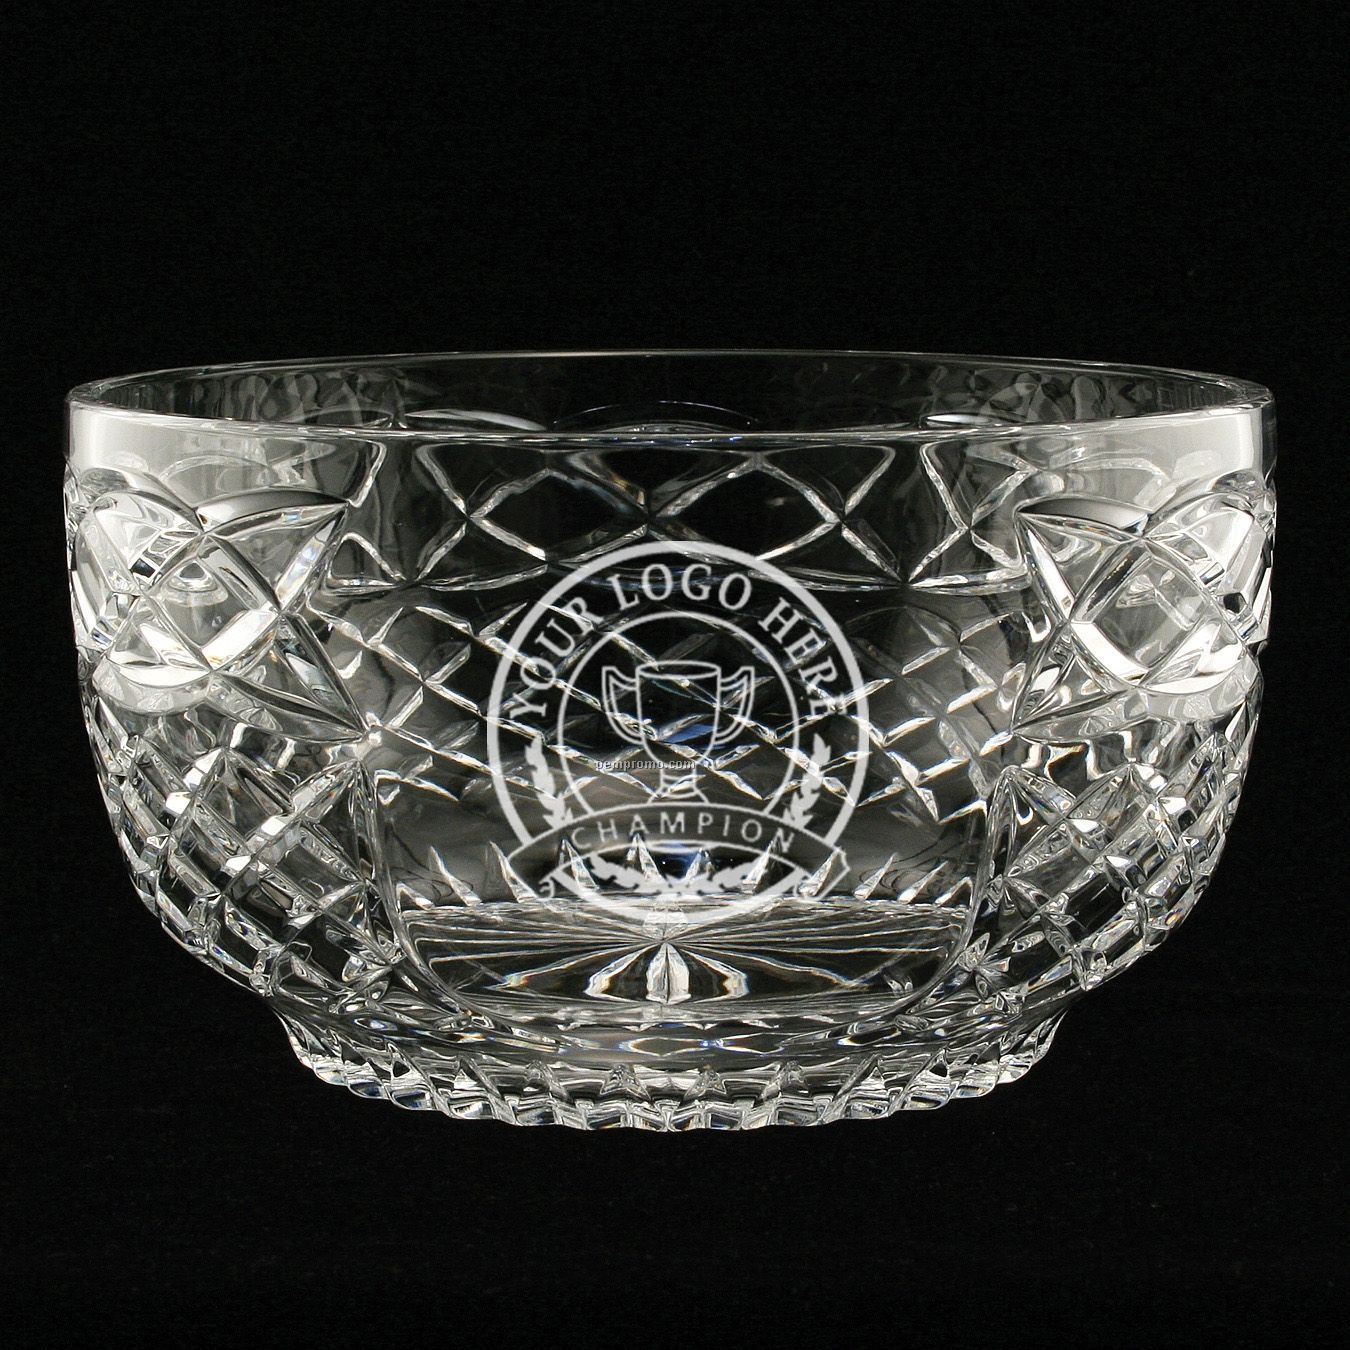 1 quart plastic fish bowl empty china wholesale 1 quart for Fish bowl cups